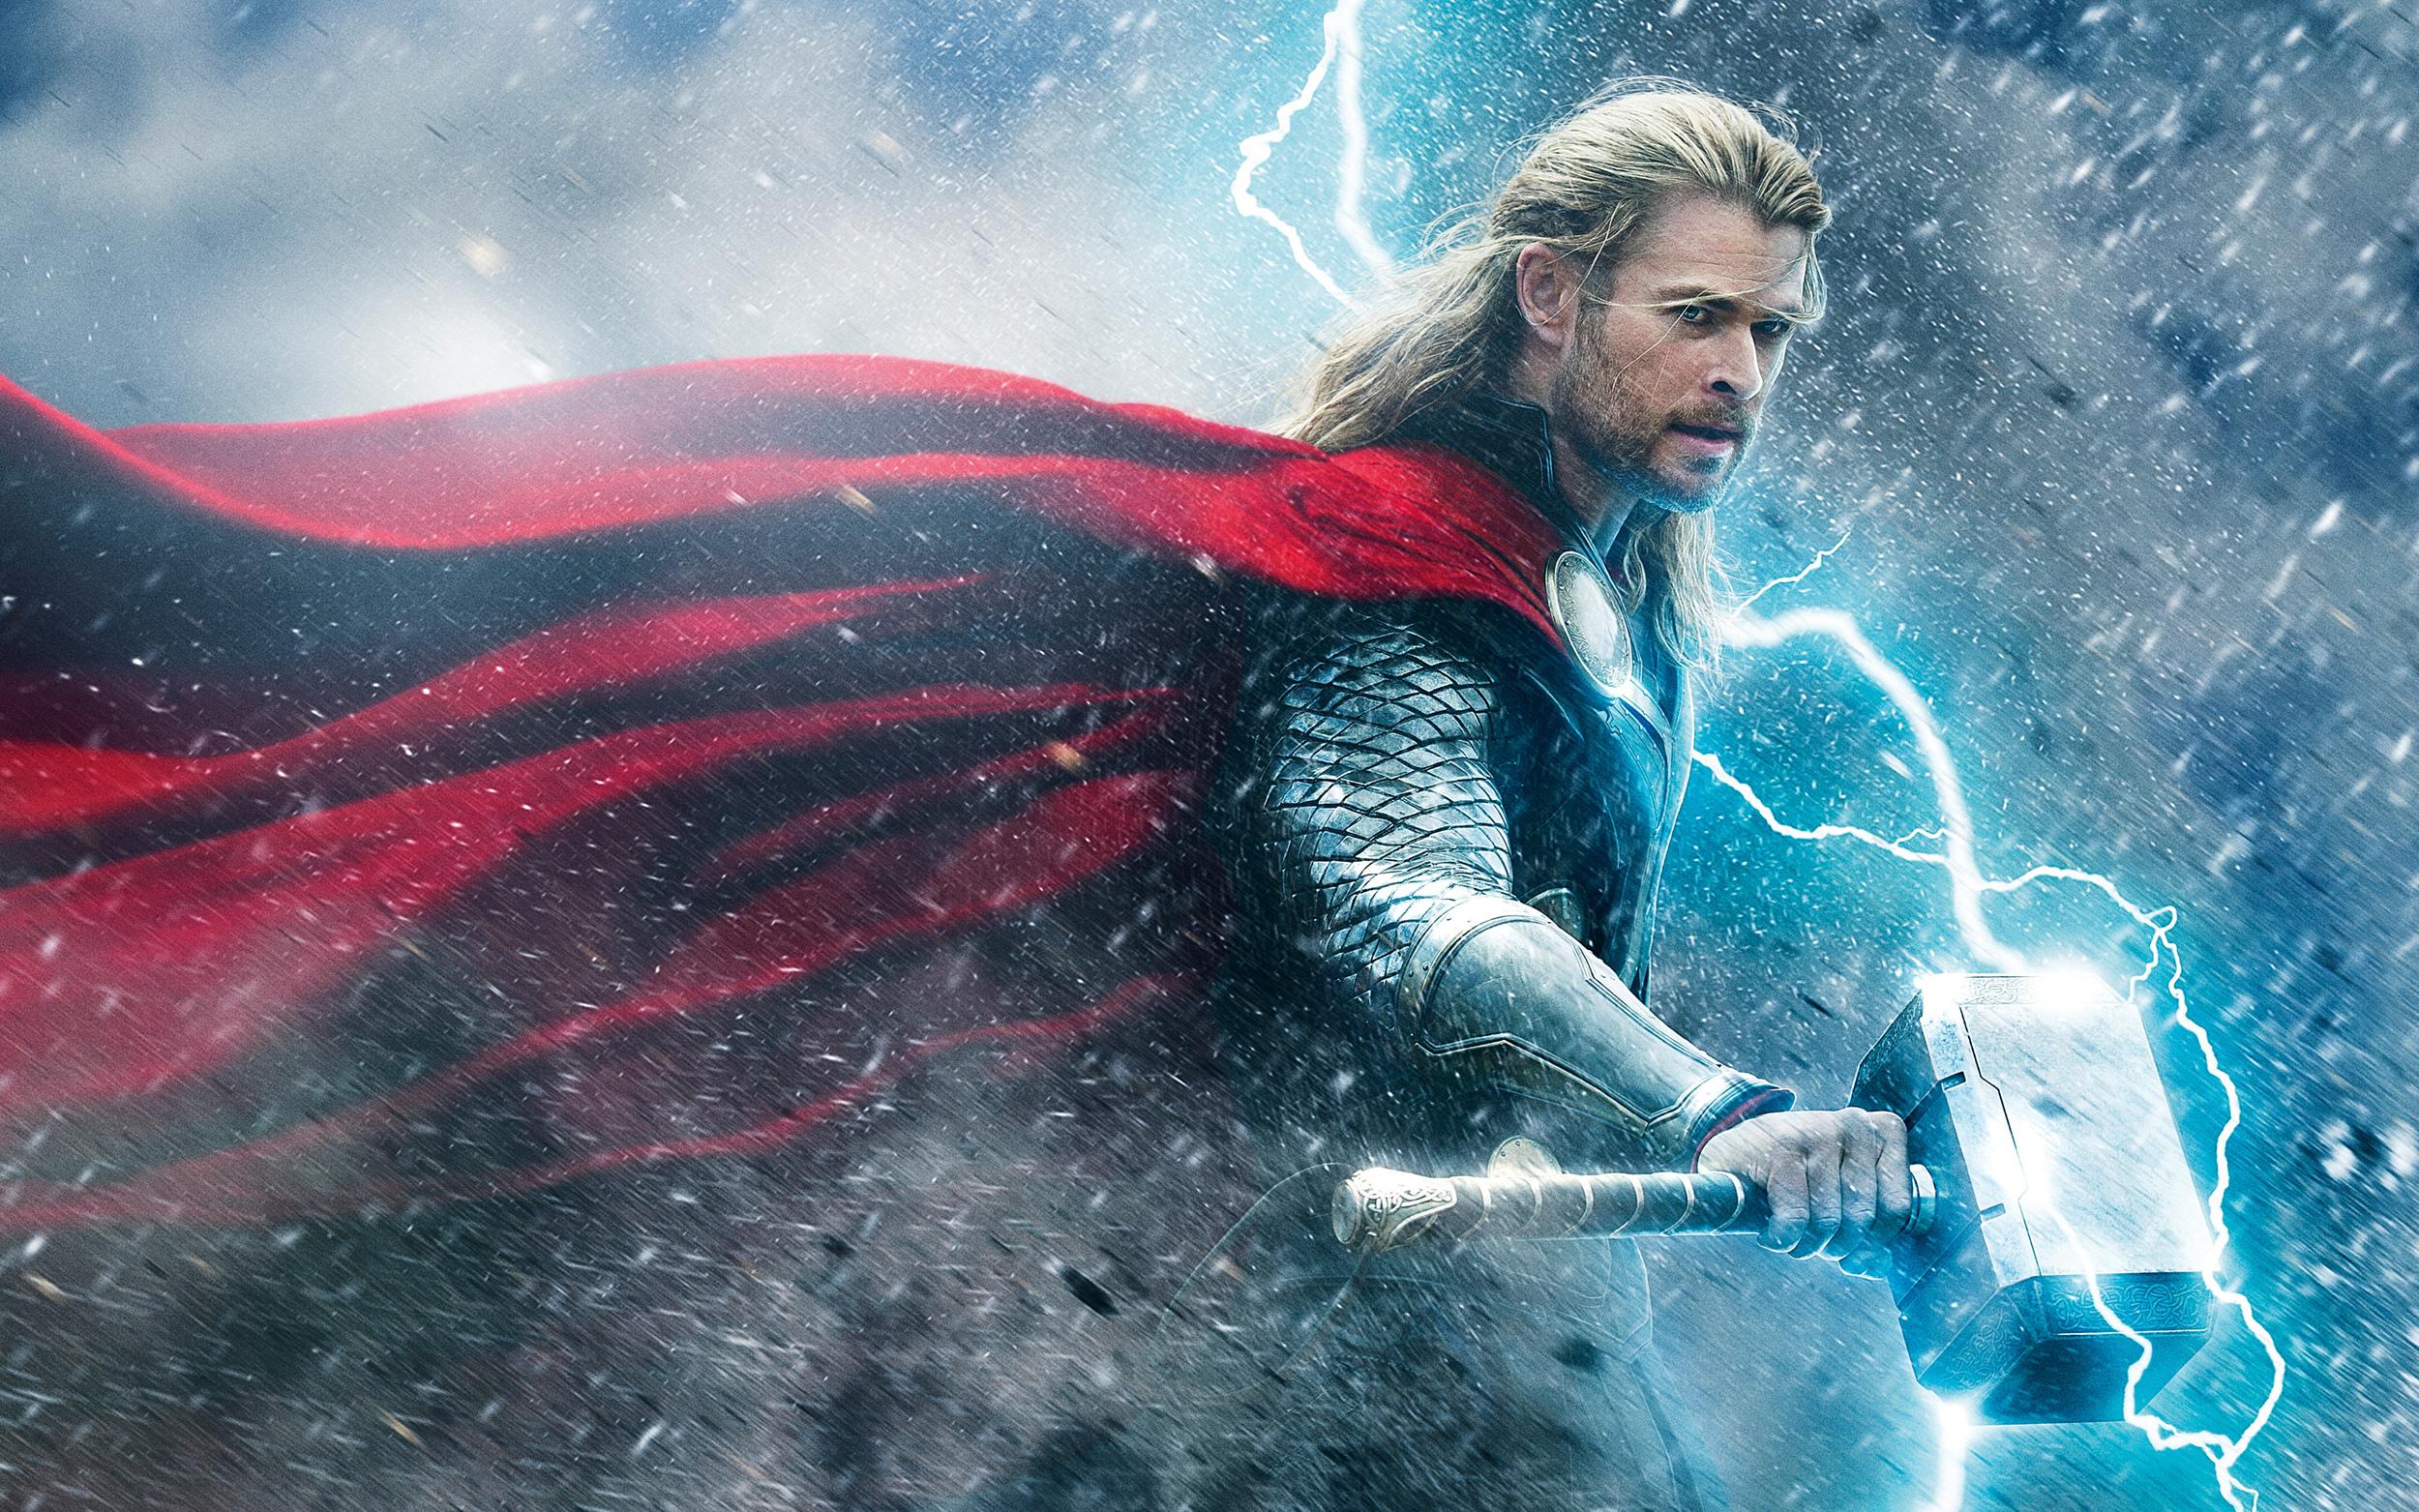 Thor-The-Dark-World-Wide-Image-1.jpg